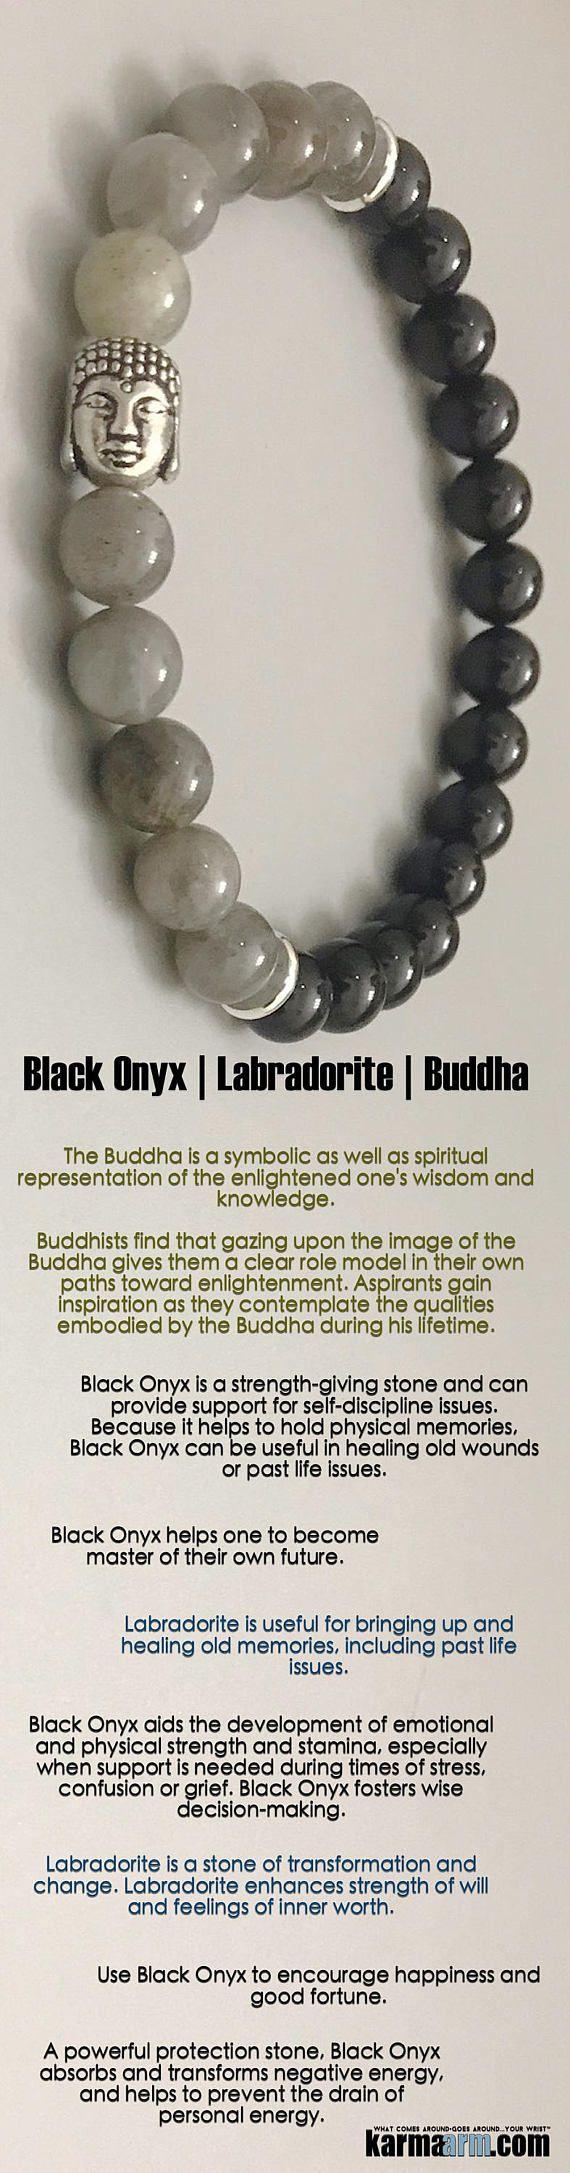 #Labradorite is a stone of #transformation and #change. #Buddha #Black #Onyx    #Beaded #Beads #Bijoux #Bracelet #Bracelets #Buddhist #Chakra #Charm #Crystals #Energy #gifts #gratitude #Handmade #Healing #Jewelry #Kundalini #LawOfAttraction #LOA #Love #Mala #Meditation #Mens #prayer #pulseiras #Reiki #Spiritual #Stacks #Stretch #Womens #Yoga #YogaBracelets #prayer